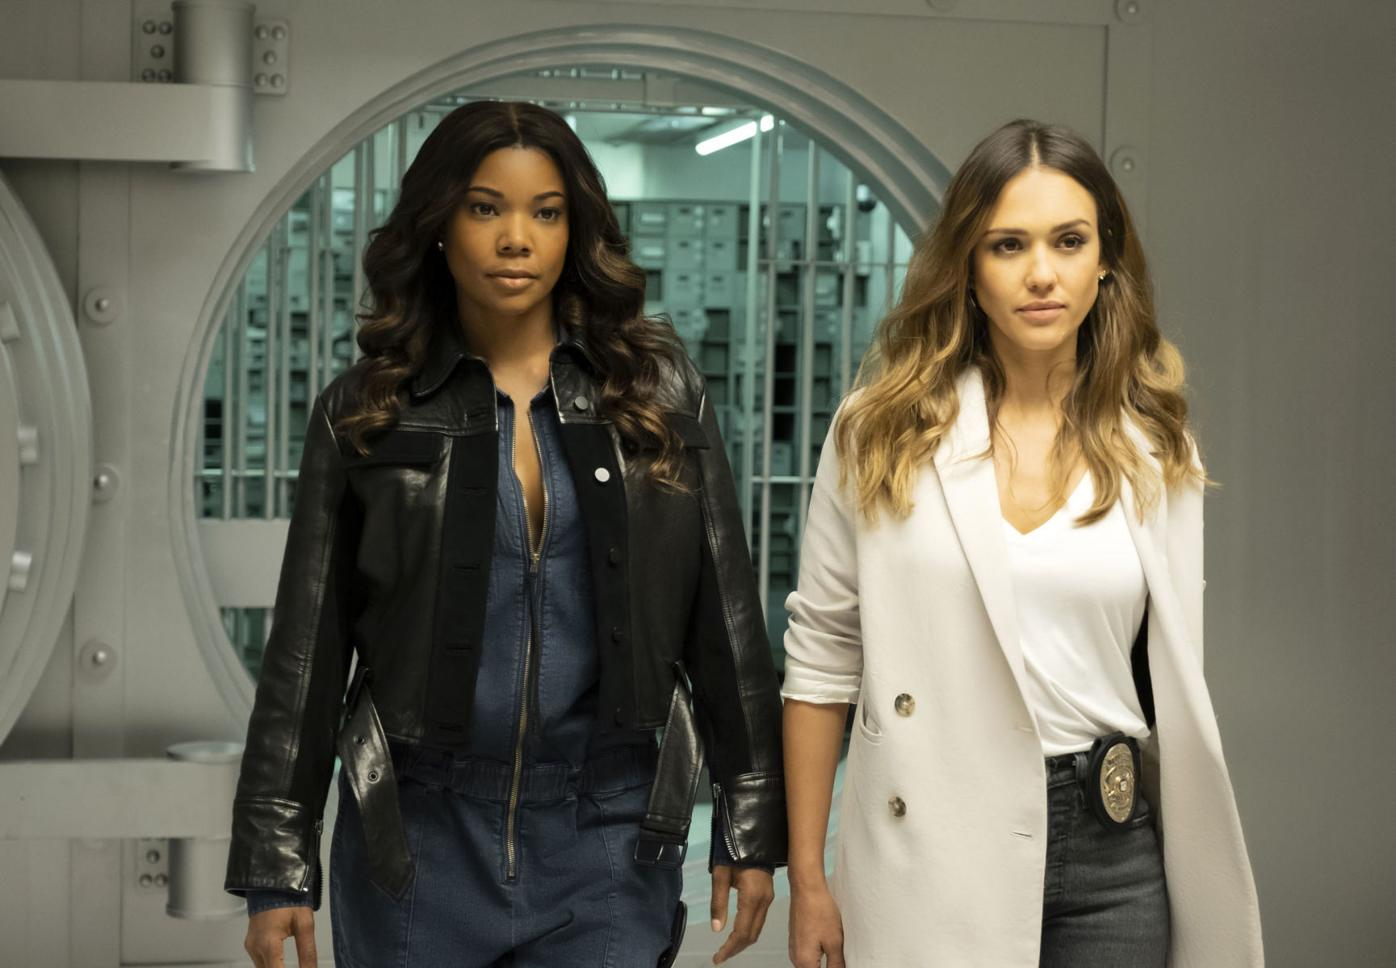 TV cliffhanger: New season in jeopardy amid virus shutdown